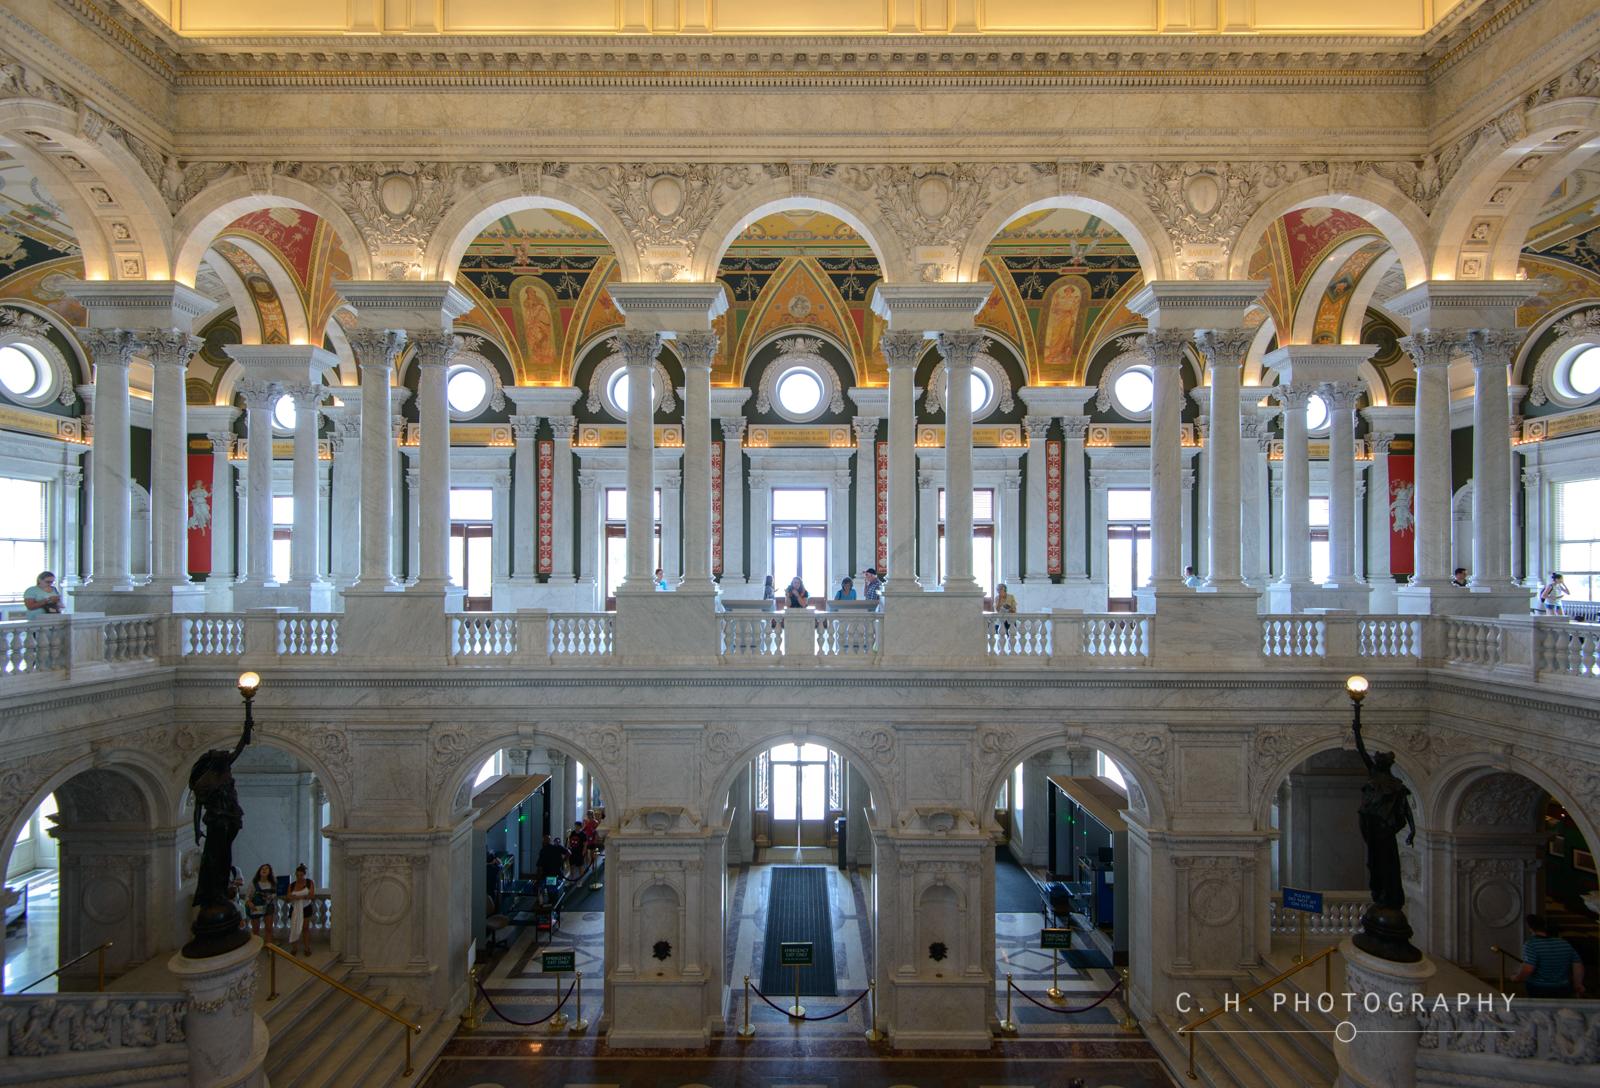 Washington D.C. - U.S.A.